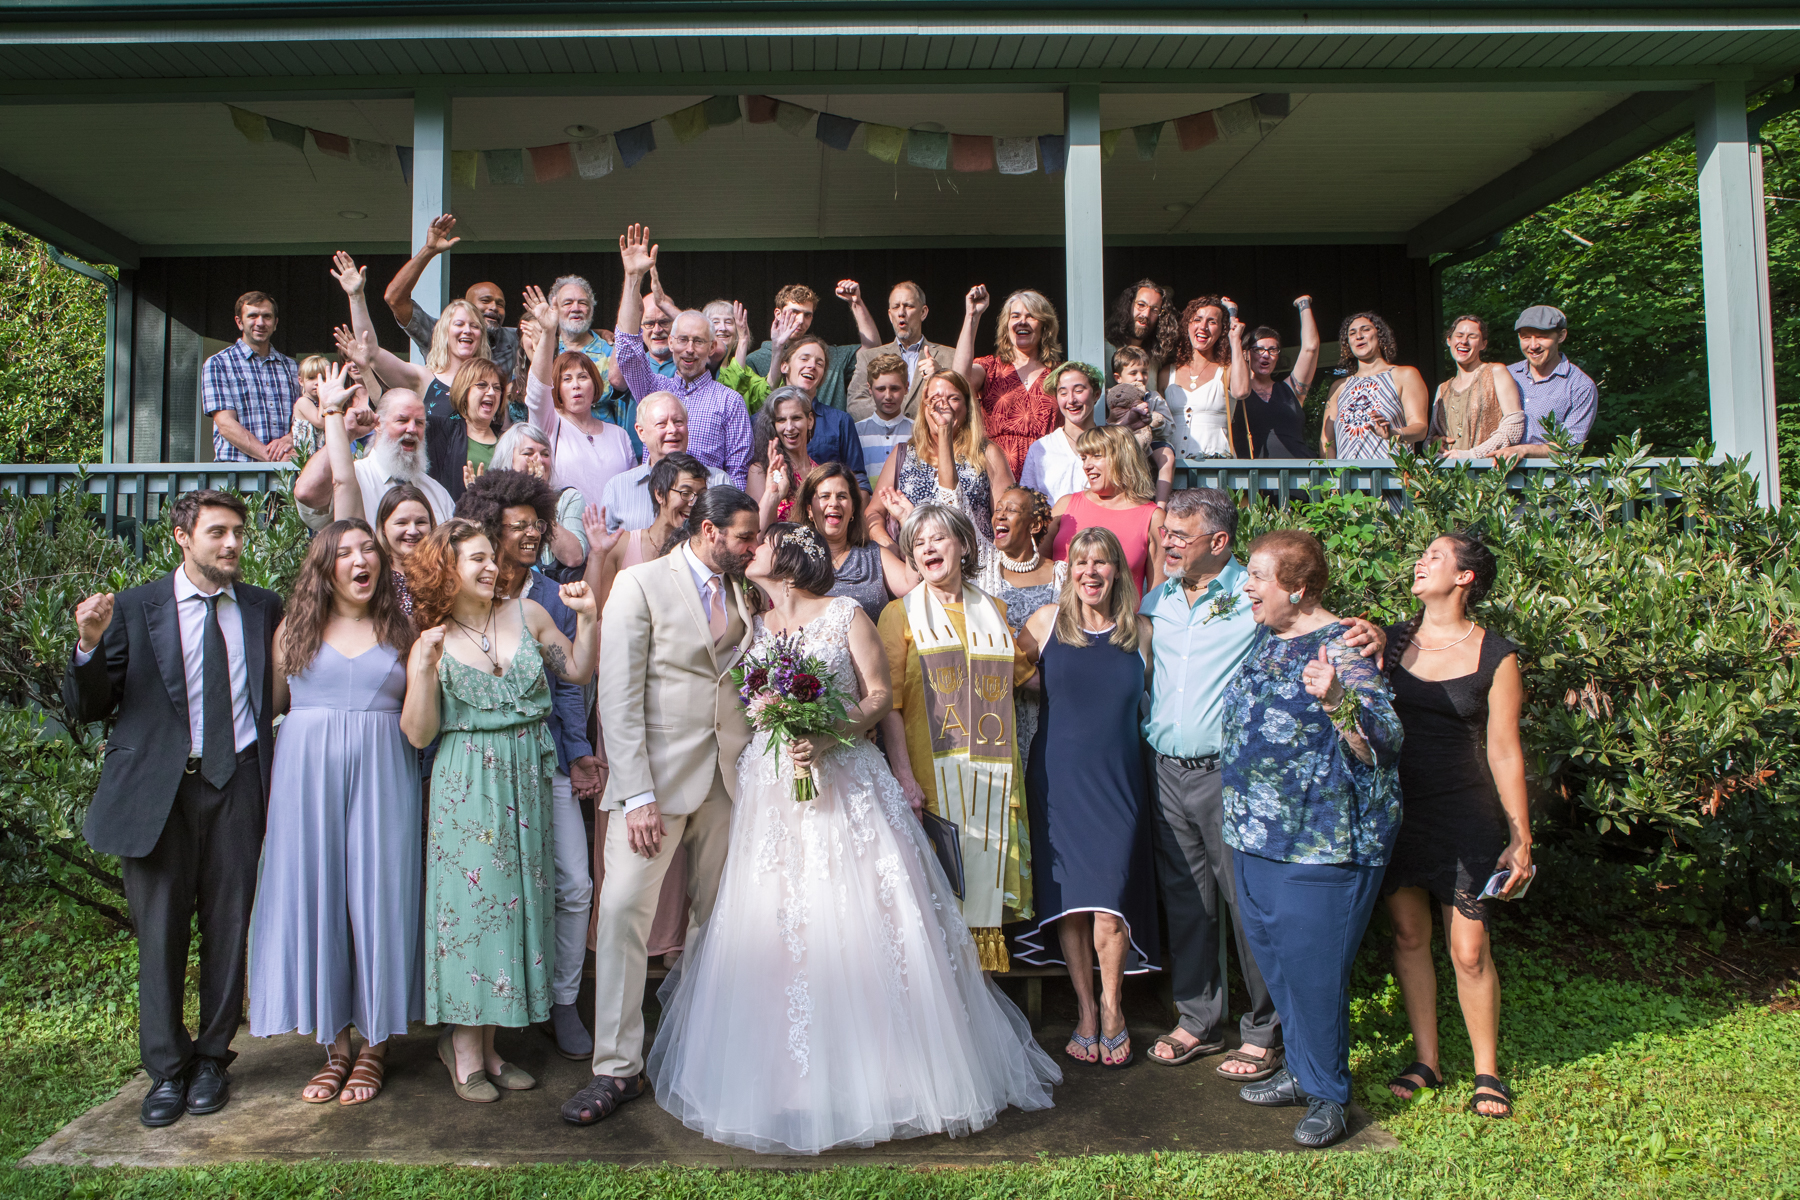 Avyanna and Phoenix Wedding 2019_photos by Studio Misha_BLOG-95.jpg